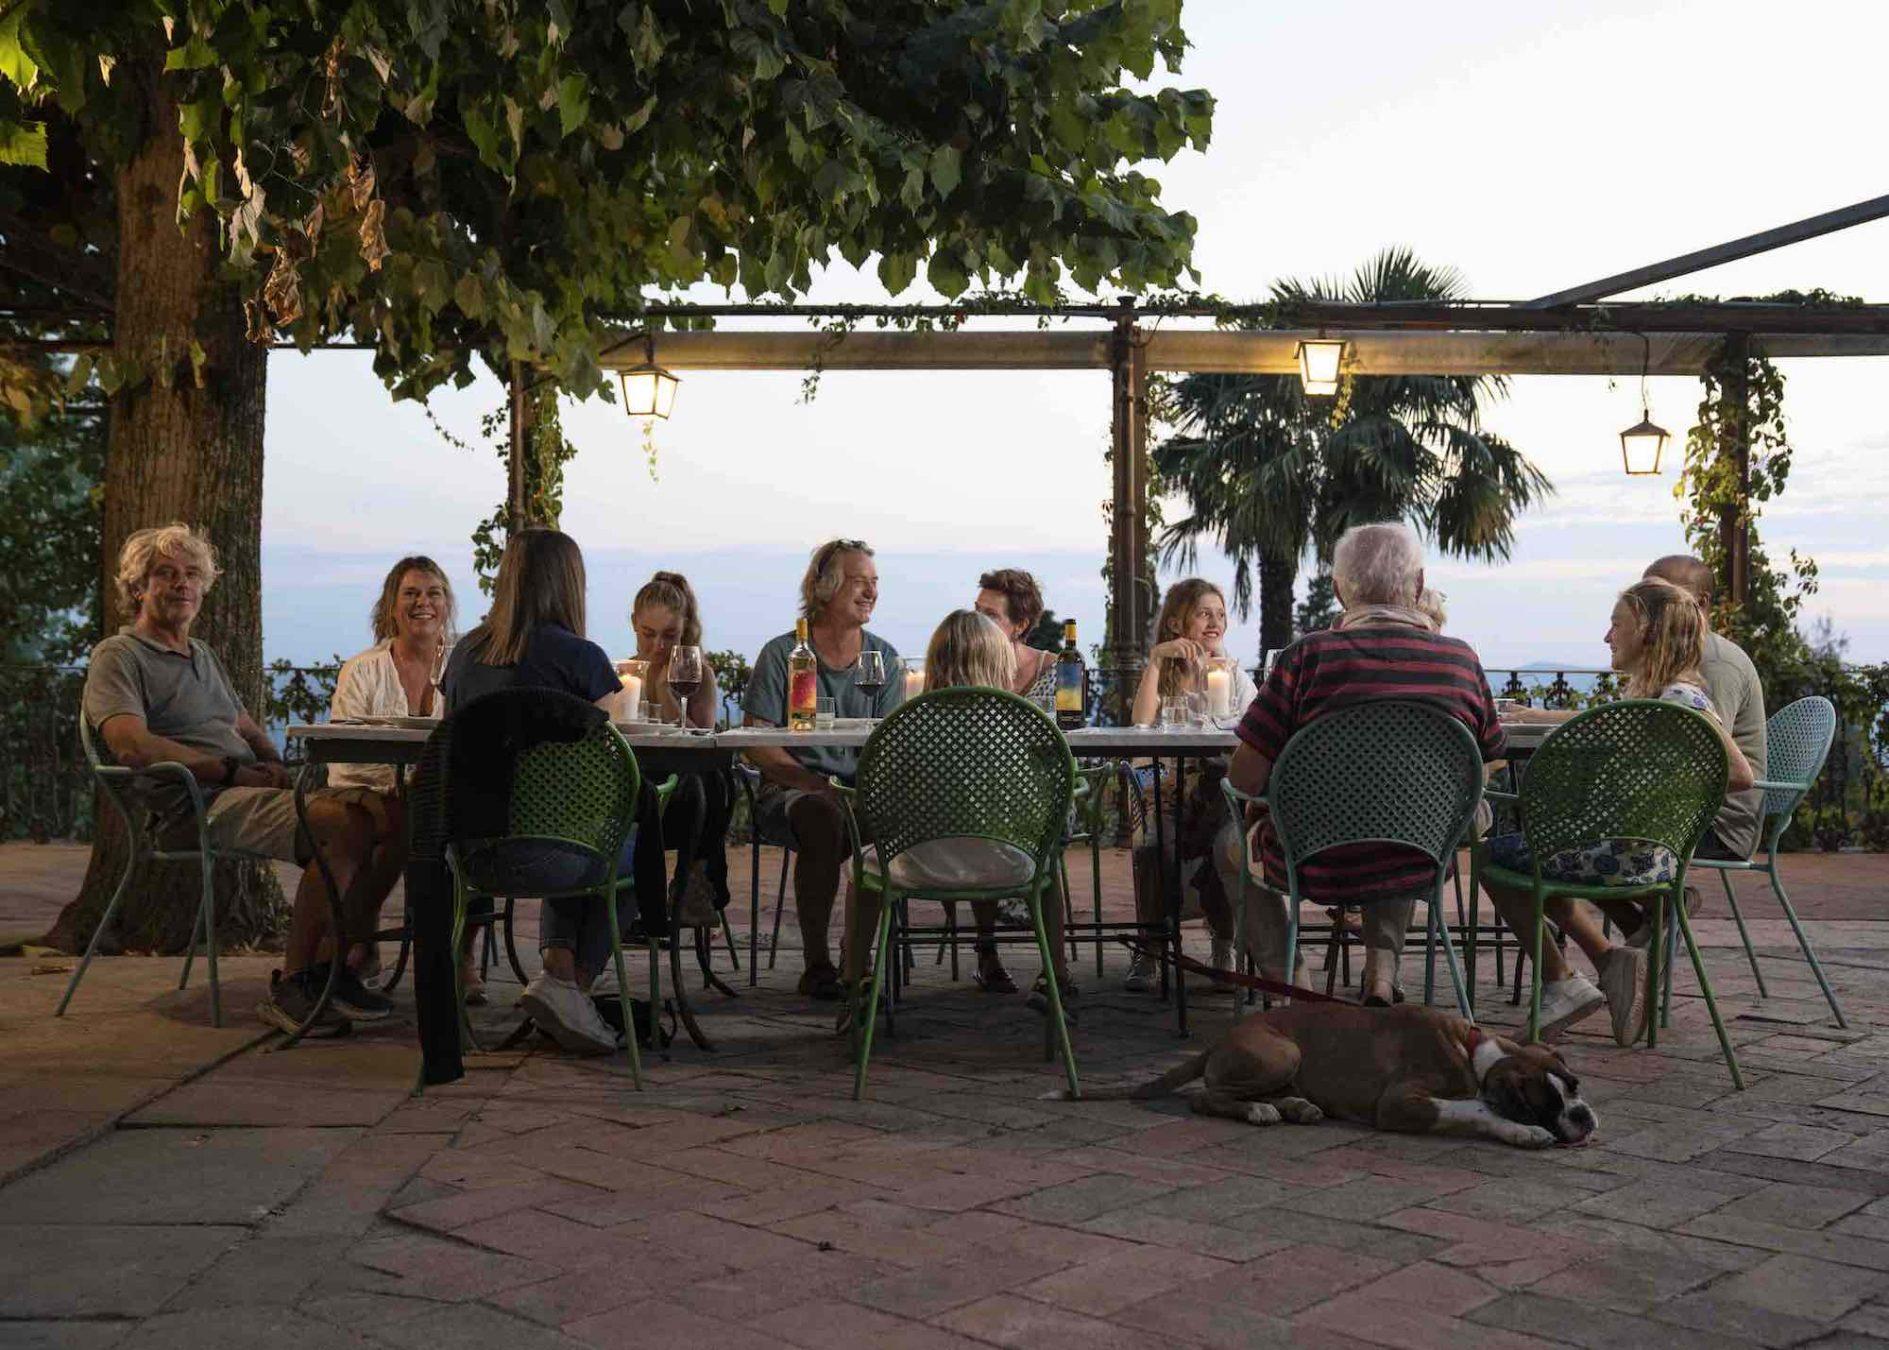 La famiglia di Bibi Gratez nel nuovo Chateau in città di Fiesole